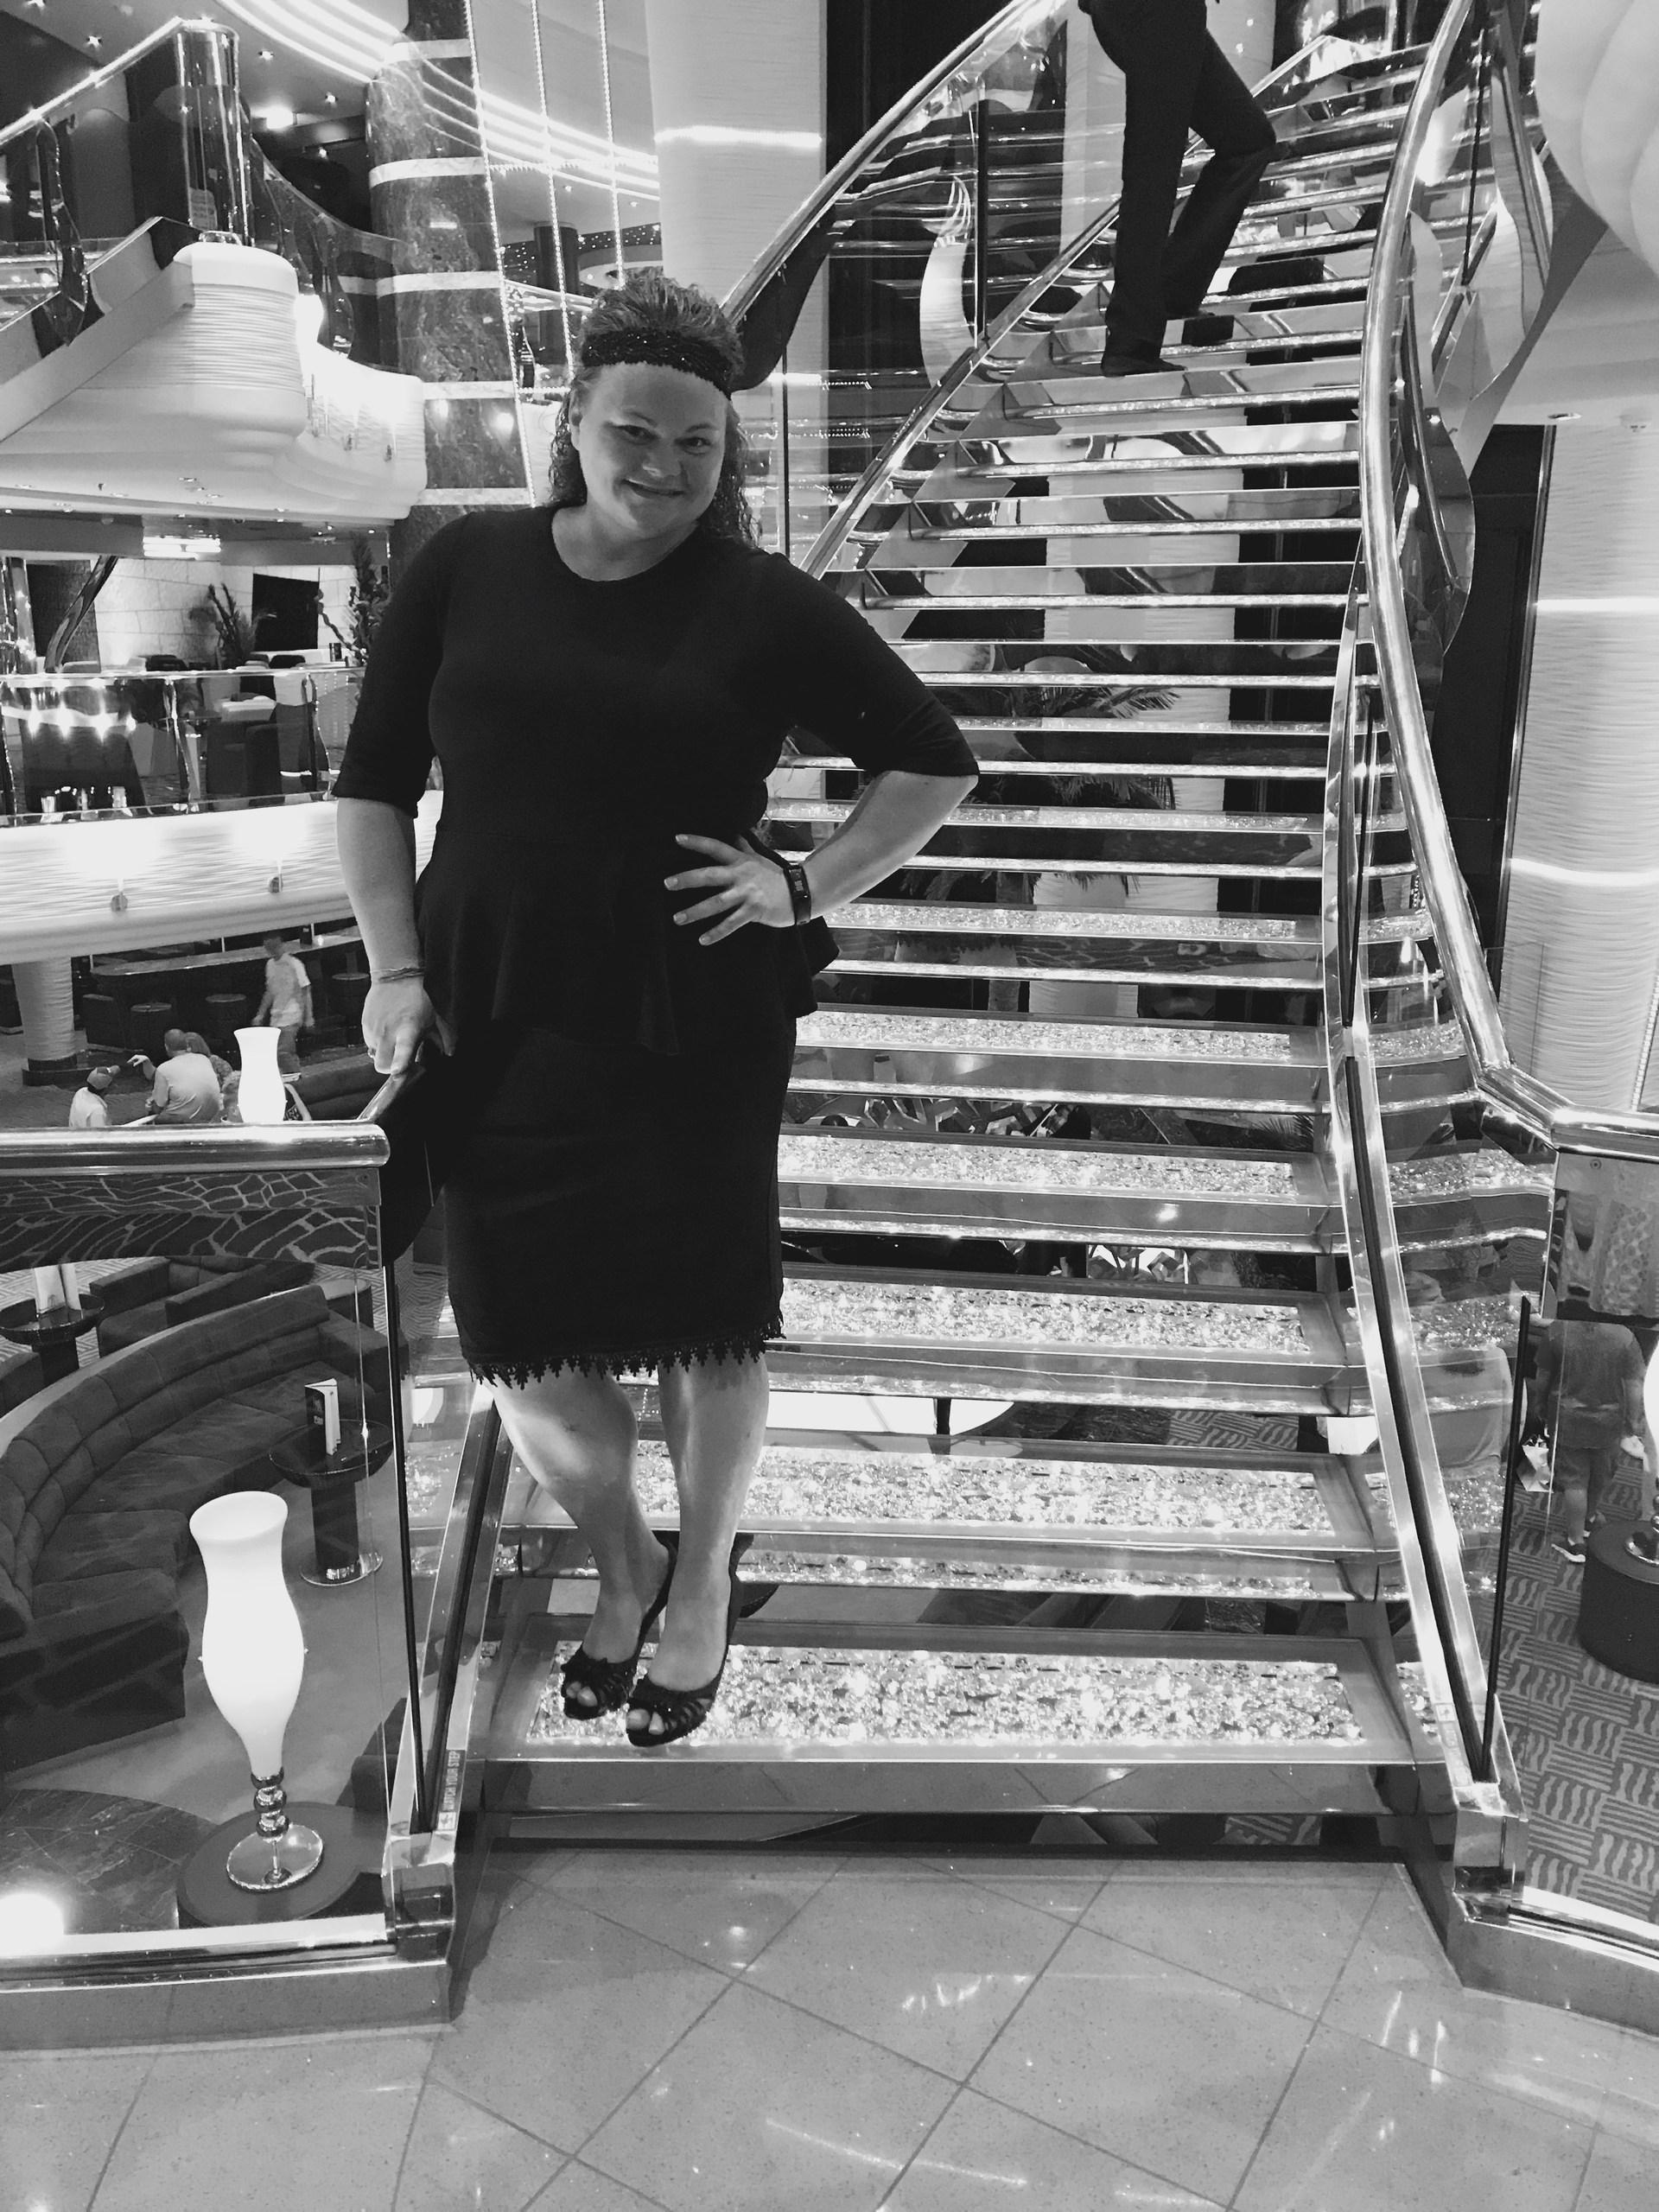 Mrs. Lozoya in a black dress by a crystal staircase.